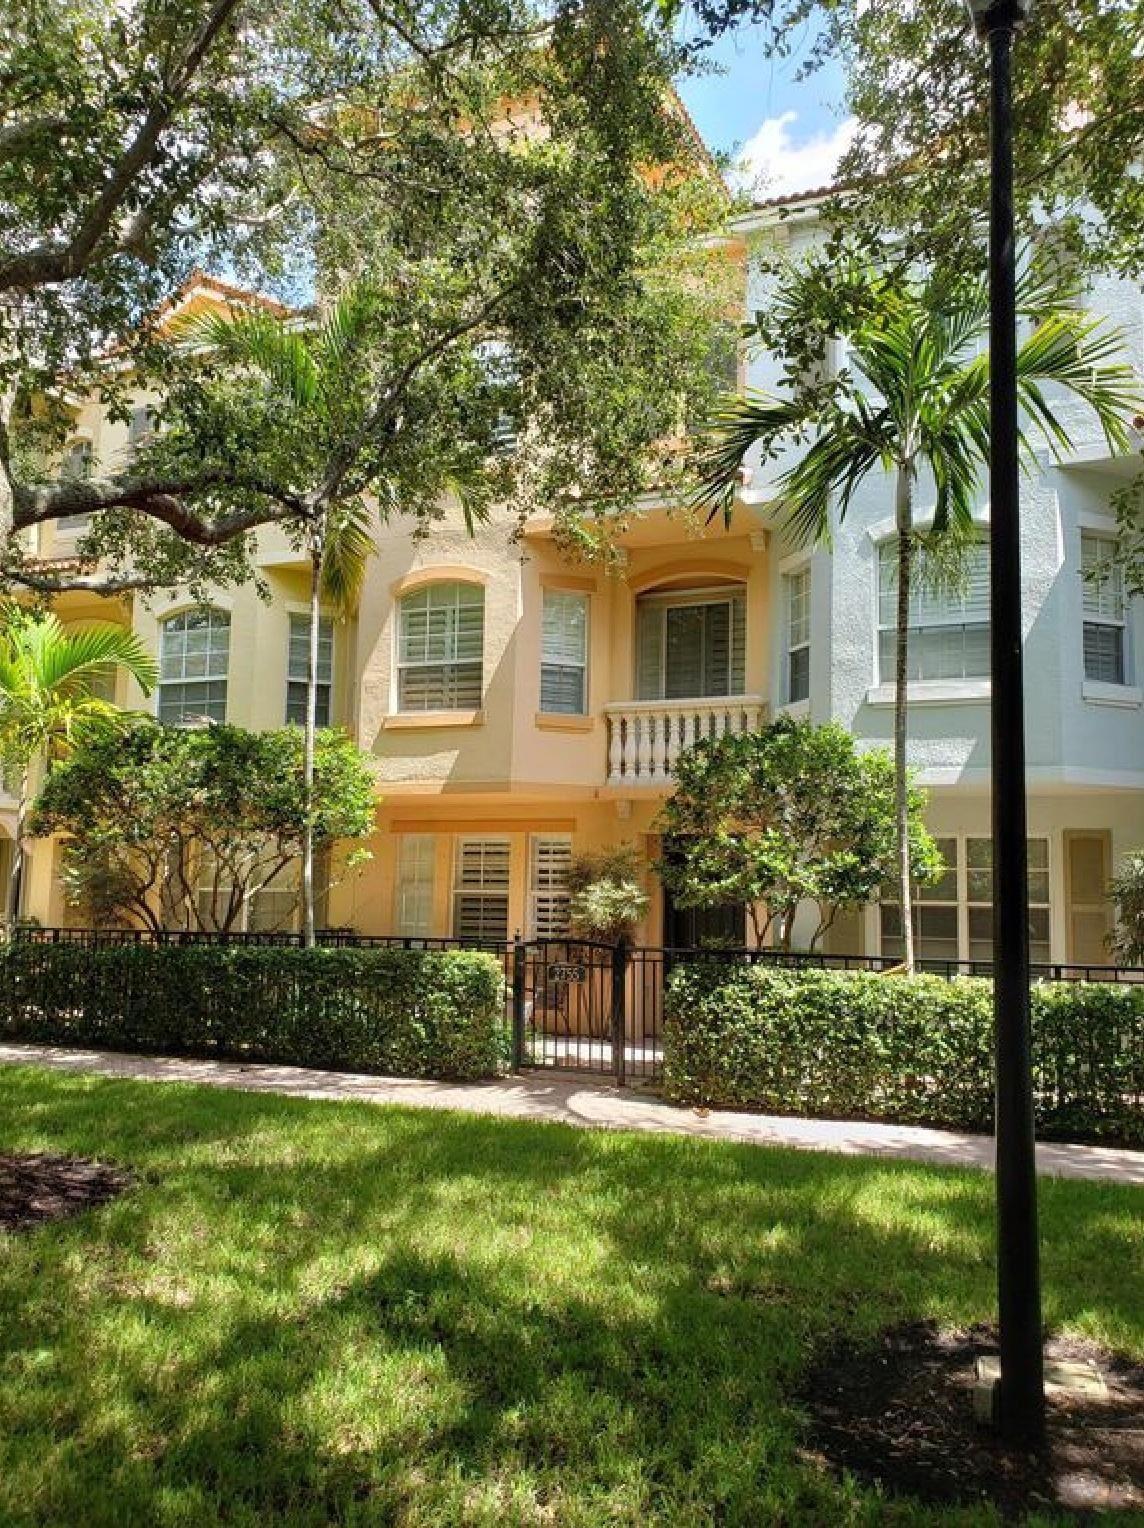 2755 Ravella Way, Palm Beach Gardens, FL 33410 - #: RX-10669971